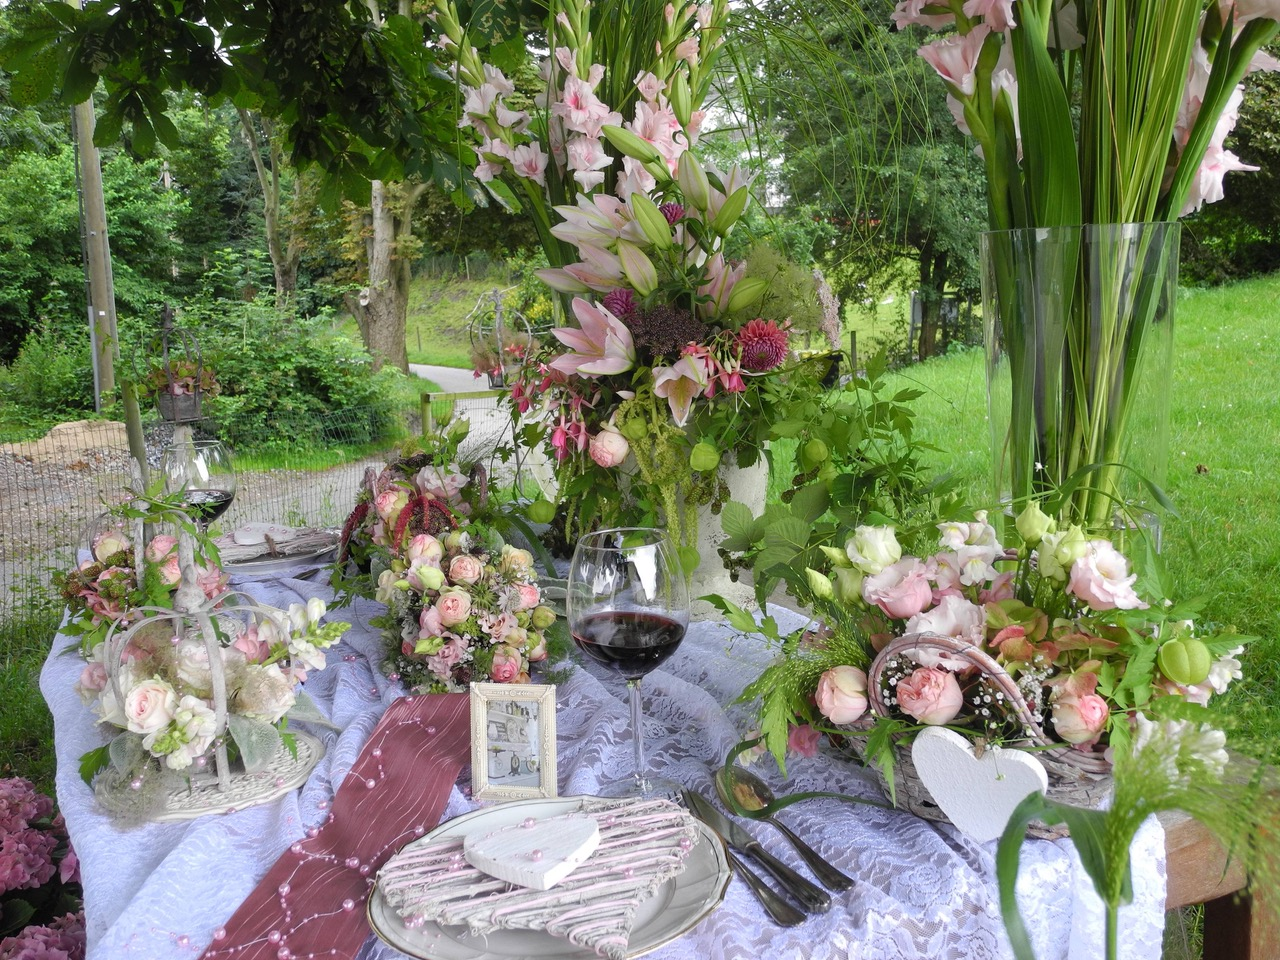 Blütenzauber by Angelika Rasche